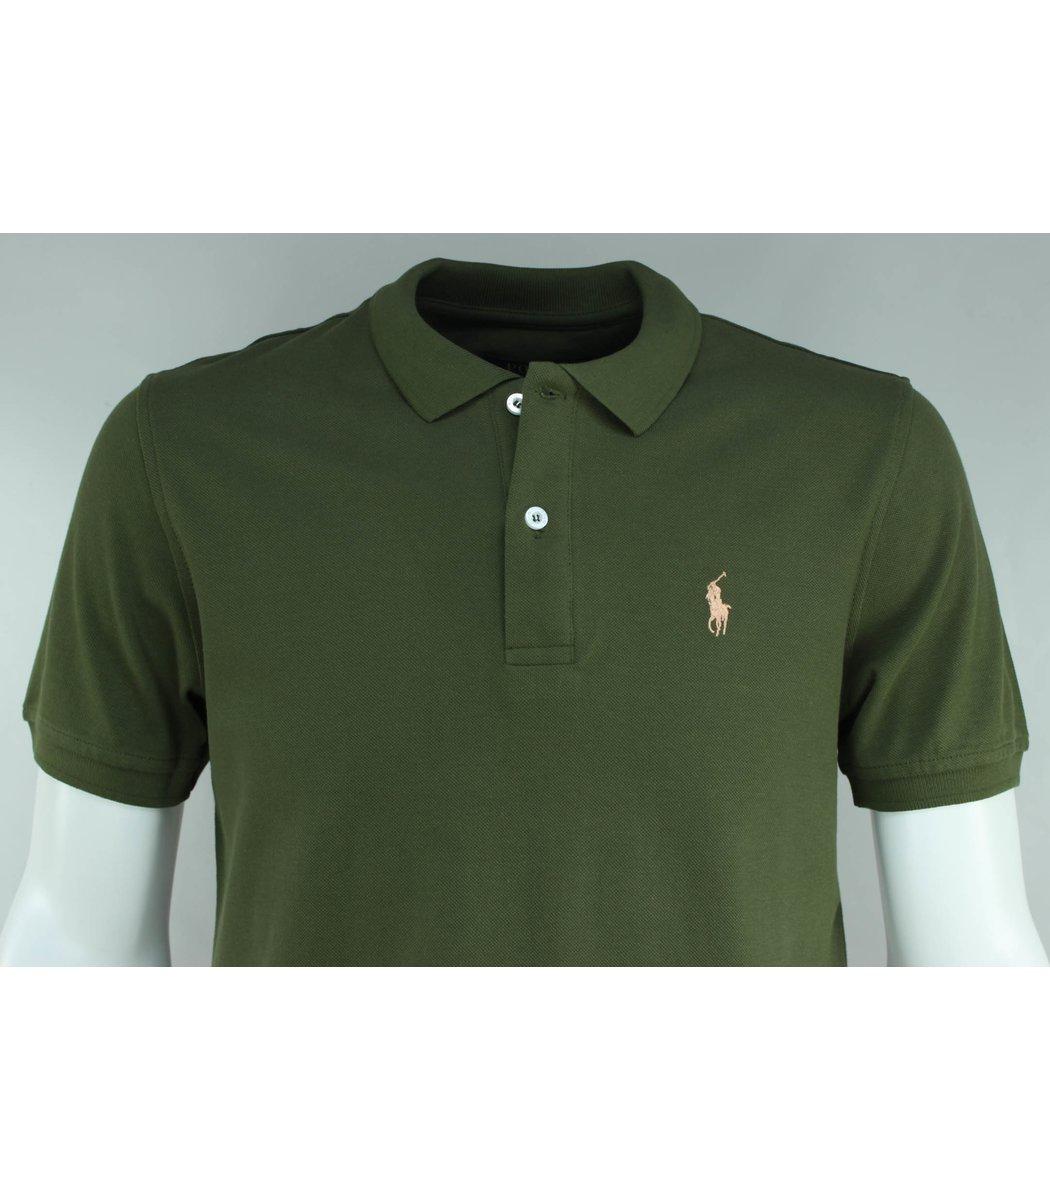 Хаки футболка поло Ralph Lauren R1